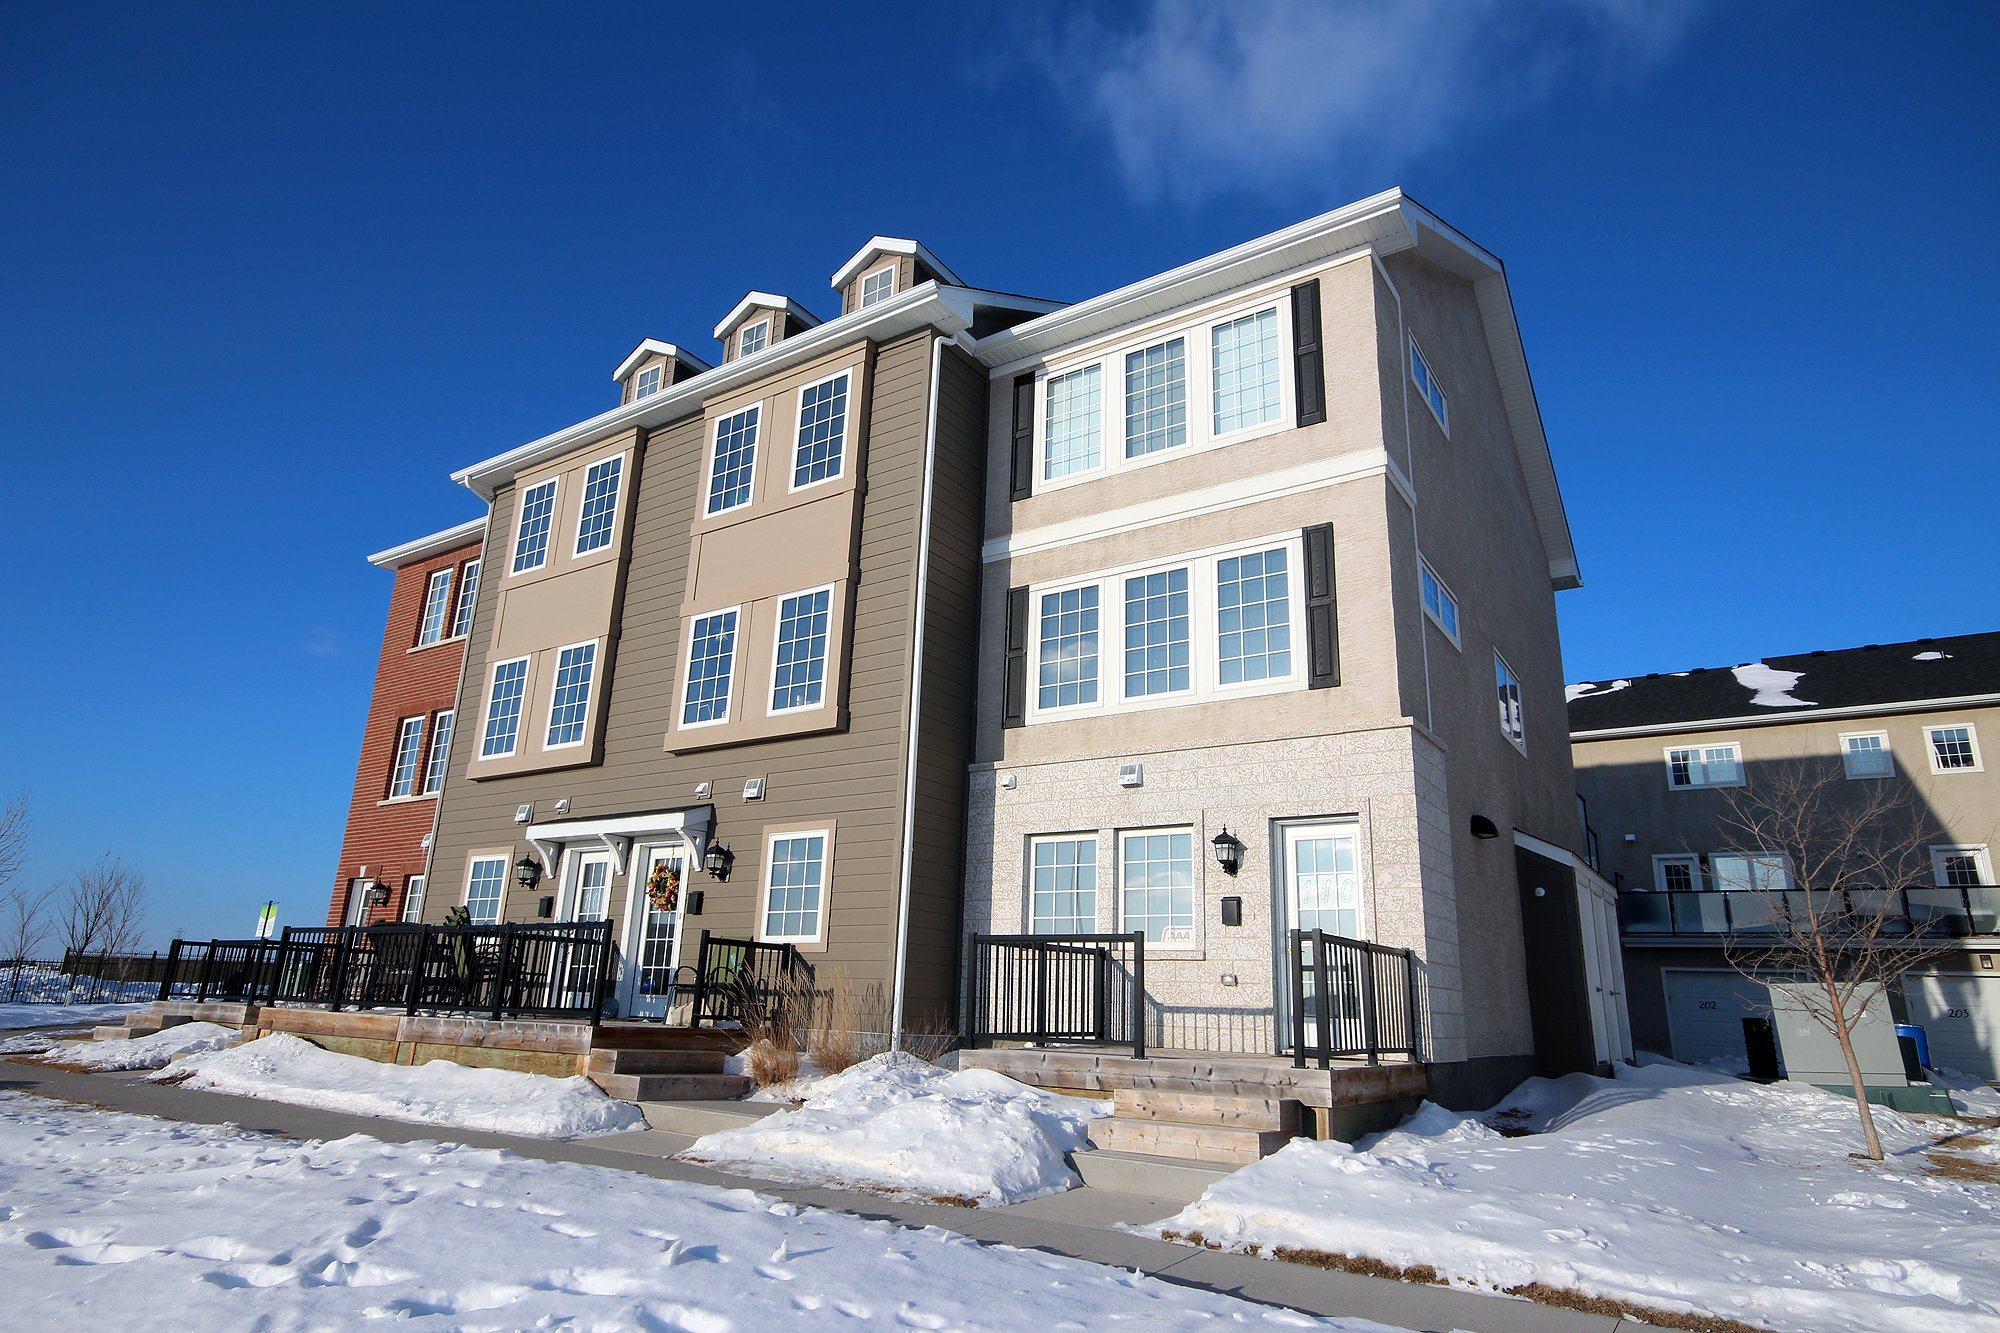 Main Photo: 110 155 Des Hivernants Boulevard North in Winnipeg: Sage Creek Condominium for sale (2K)  : MLS®# 1901813